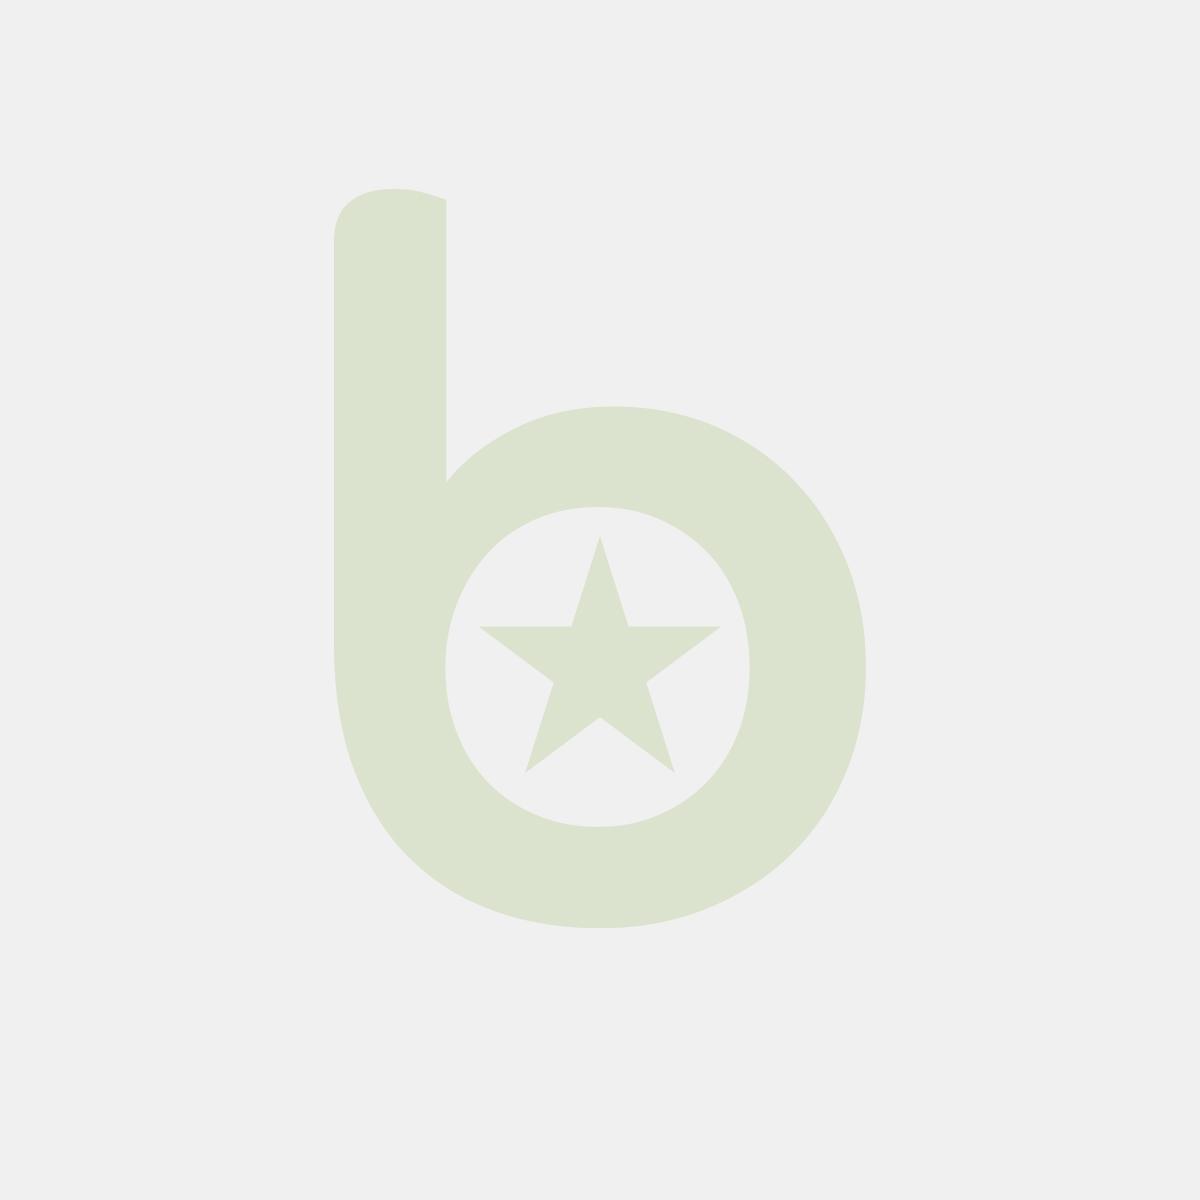 Folia wieczkowa 185/250m PP DUNI 65mikr. PEEL + ANTIFOG